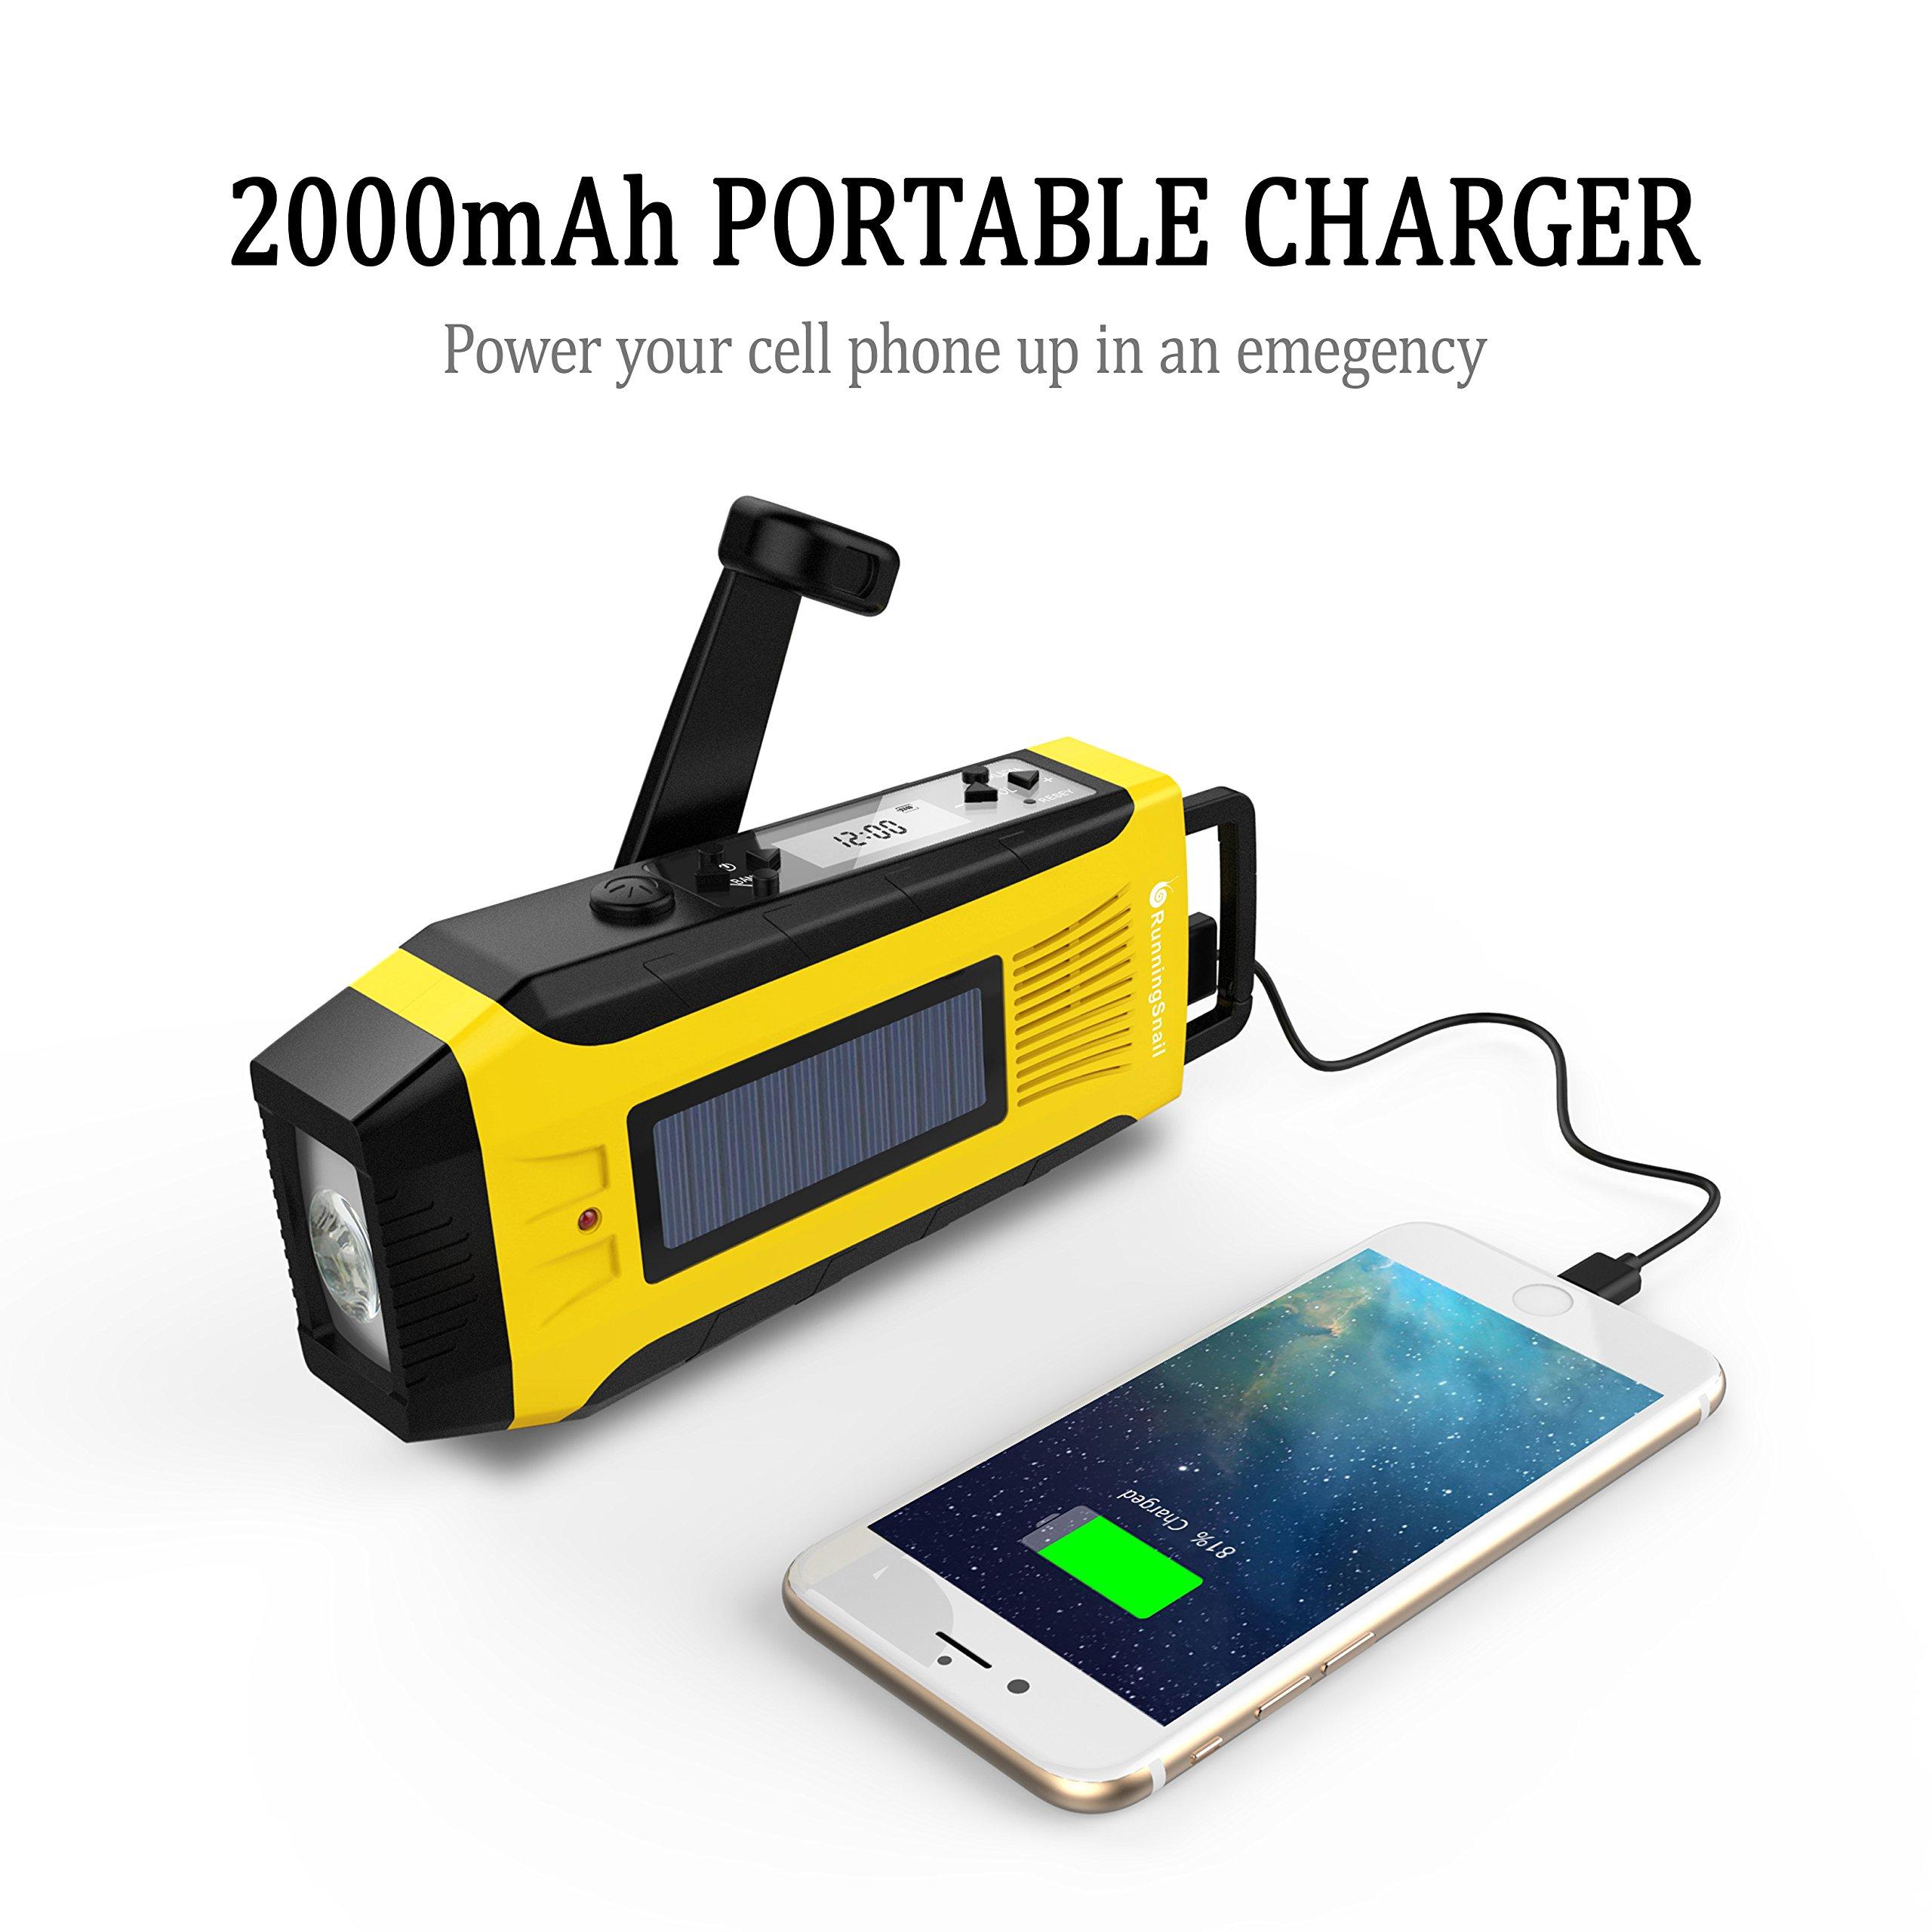 RunningSnail AM/FM NOAA Weather Emergency Solar Digital Crank Radio with 3W LED Flashlight, SOS Alarm & 2000MAh Power Bank(Yellow) … by RunningSnail (Image #6)